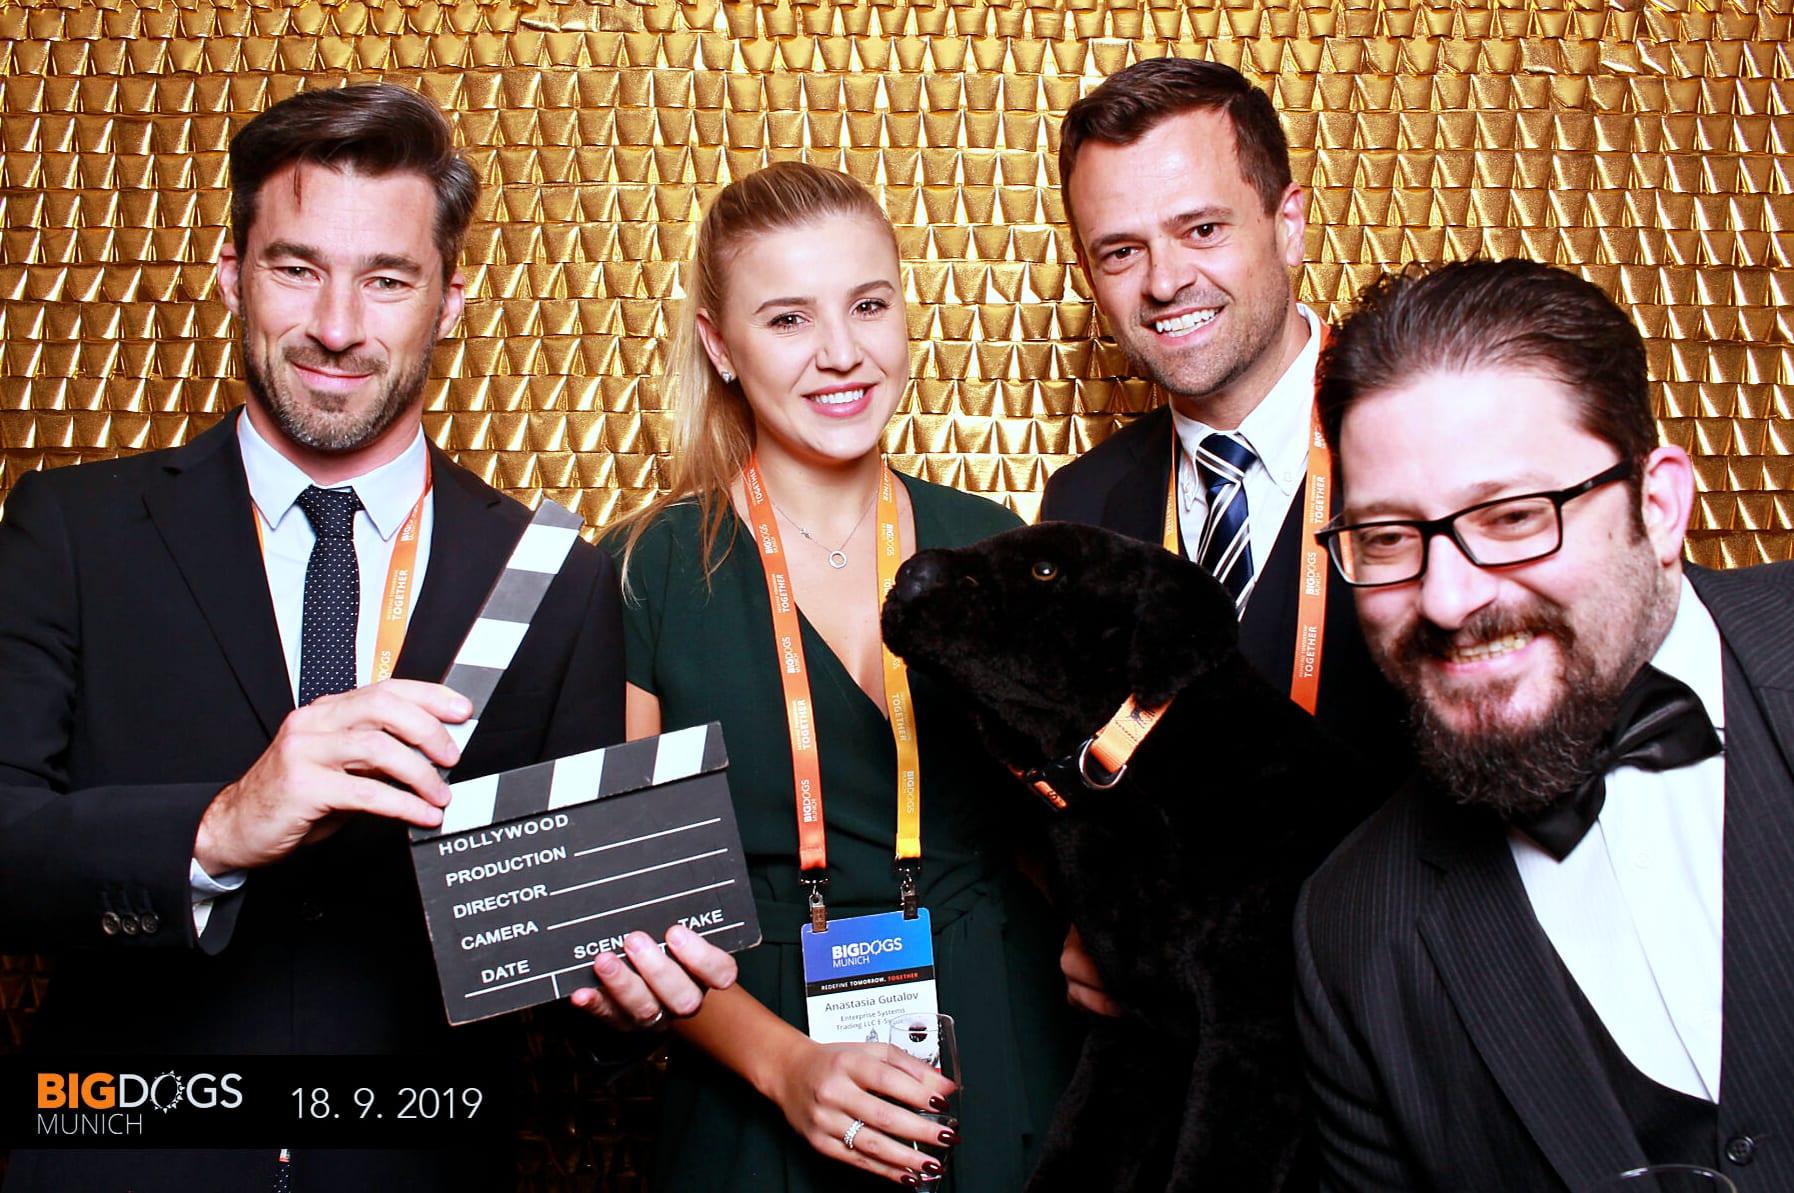 fotokoutek-konference-bigdogs-18-9-2019-652729